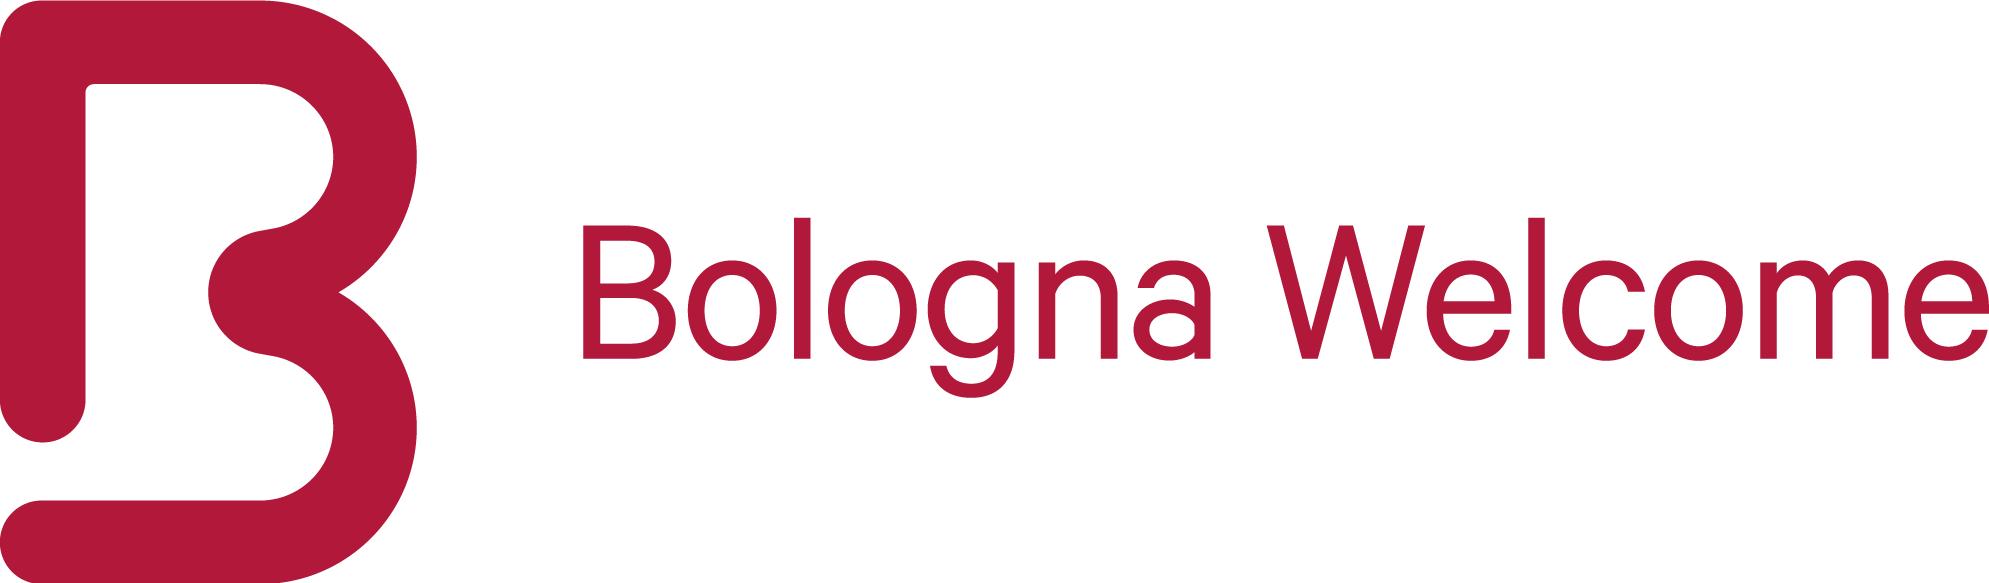 Bologna Welcome.